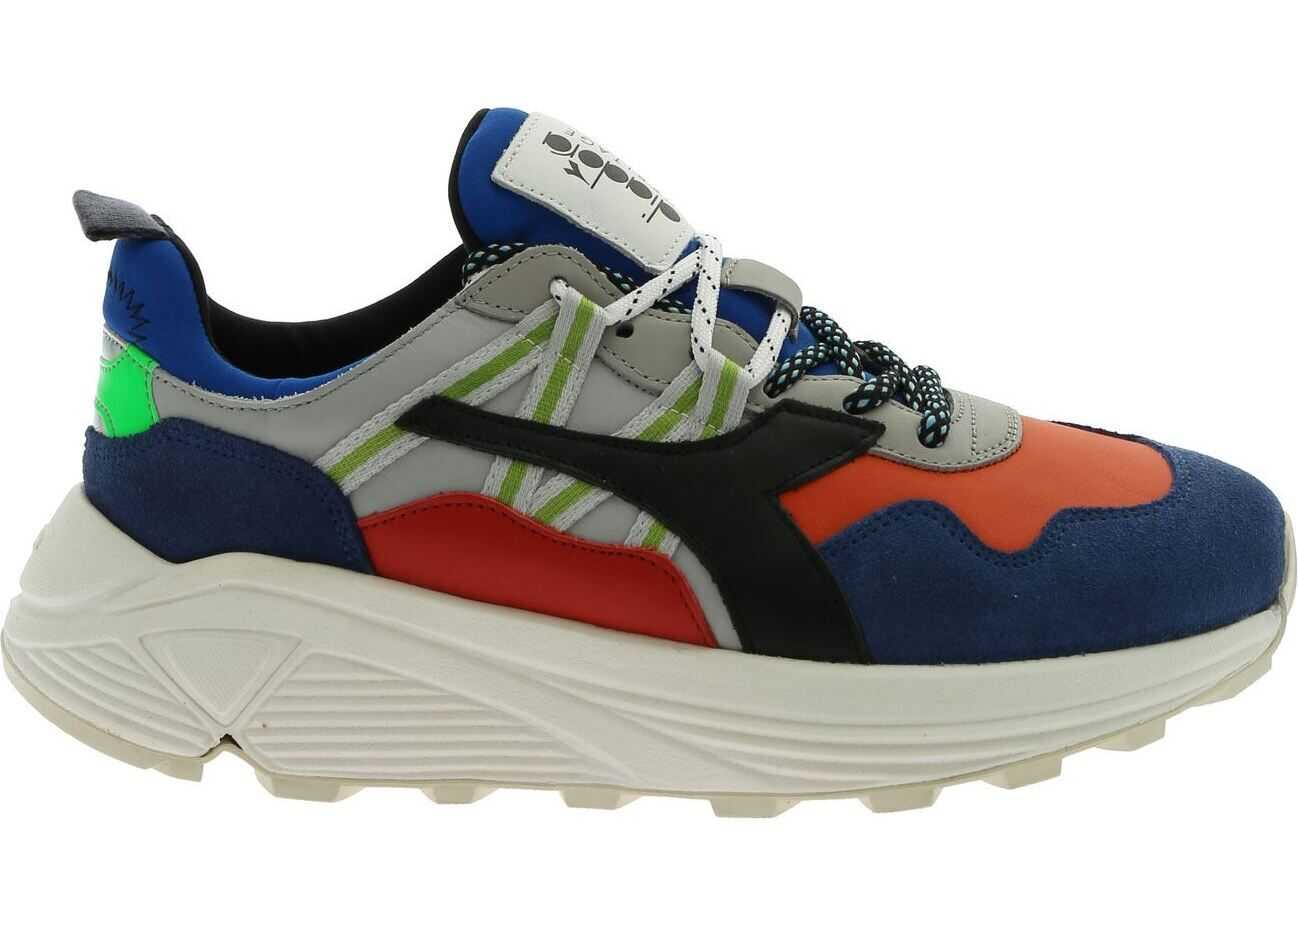 Diadora Heritage Rave Pop Sneakers In Multicolor Multi